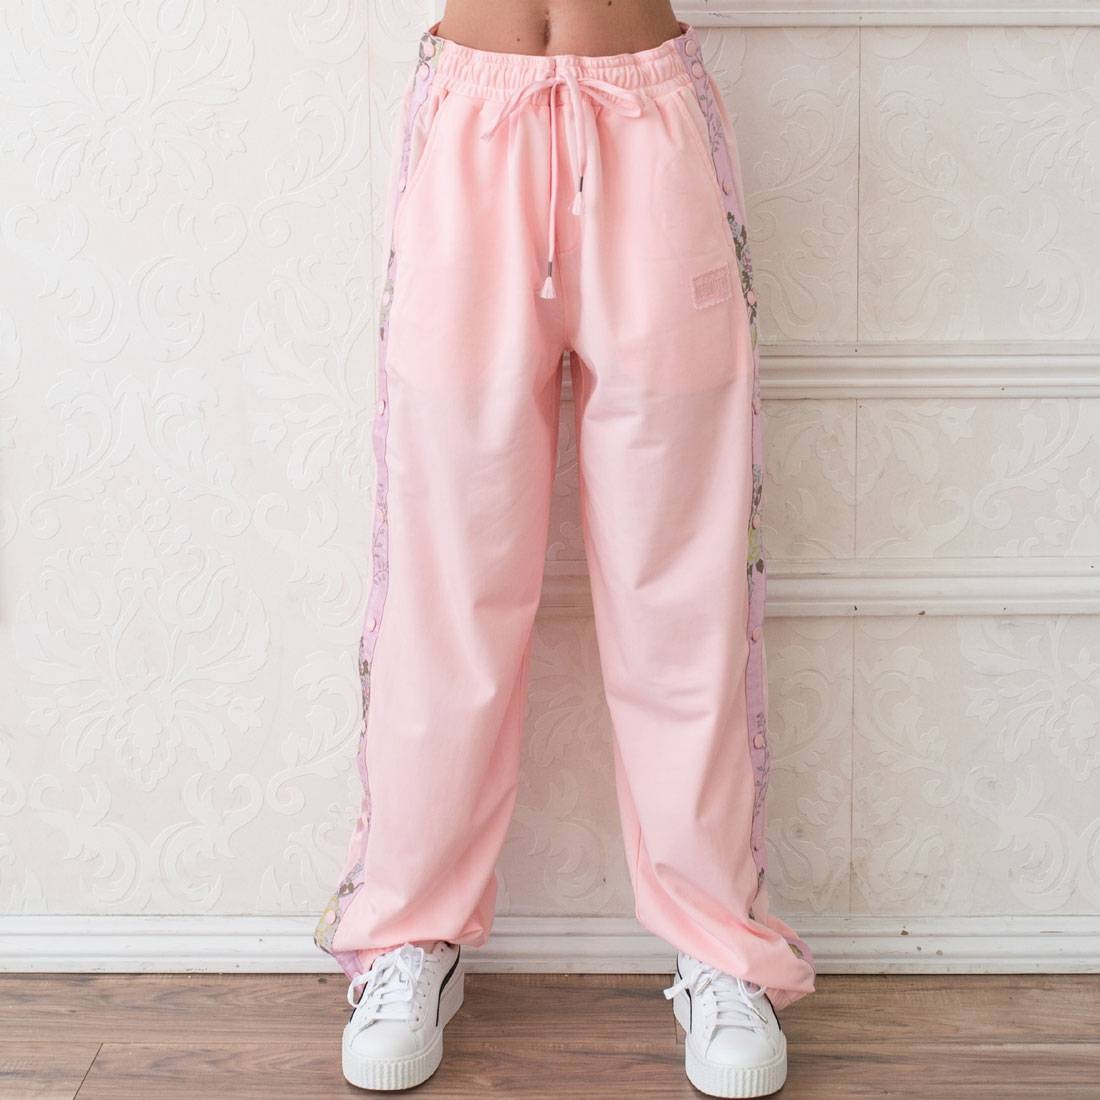 Puma x Fenty by Rihanna Women Tearaway Track Pants (pink)